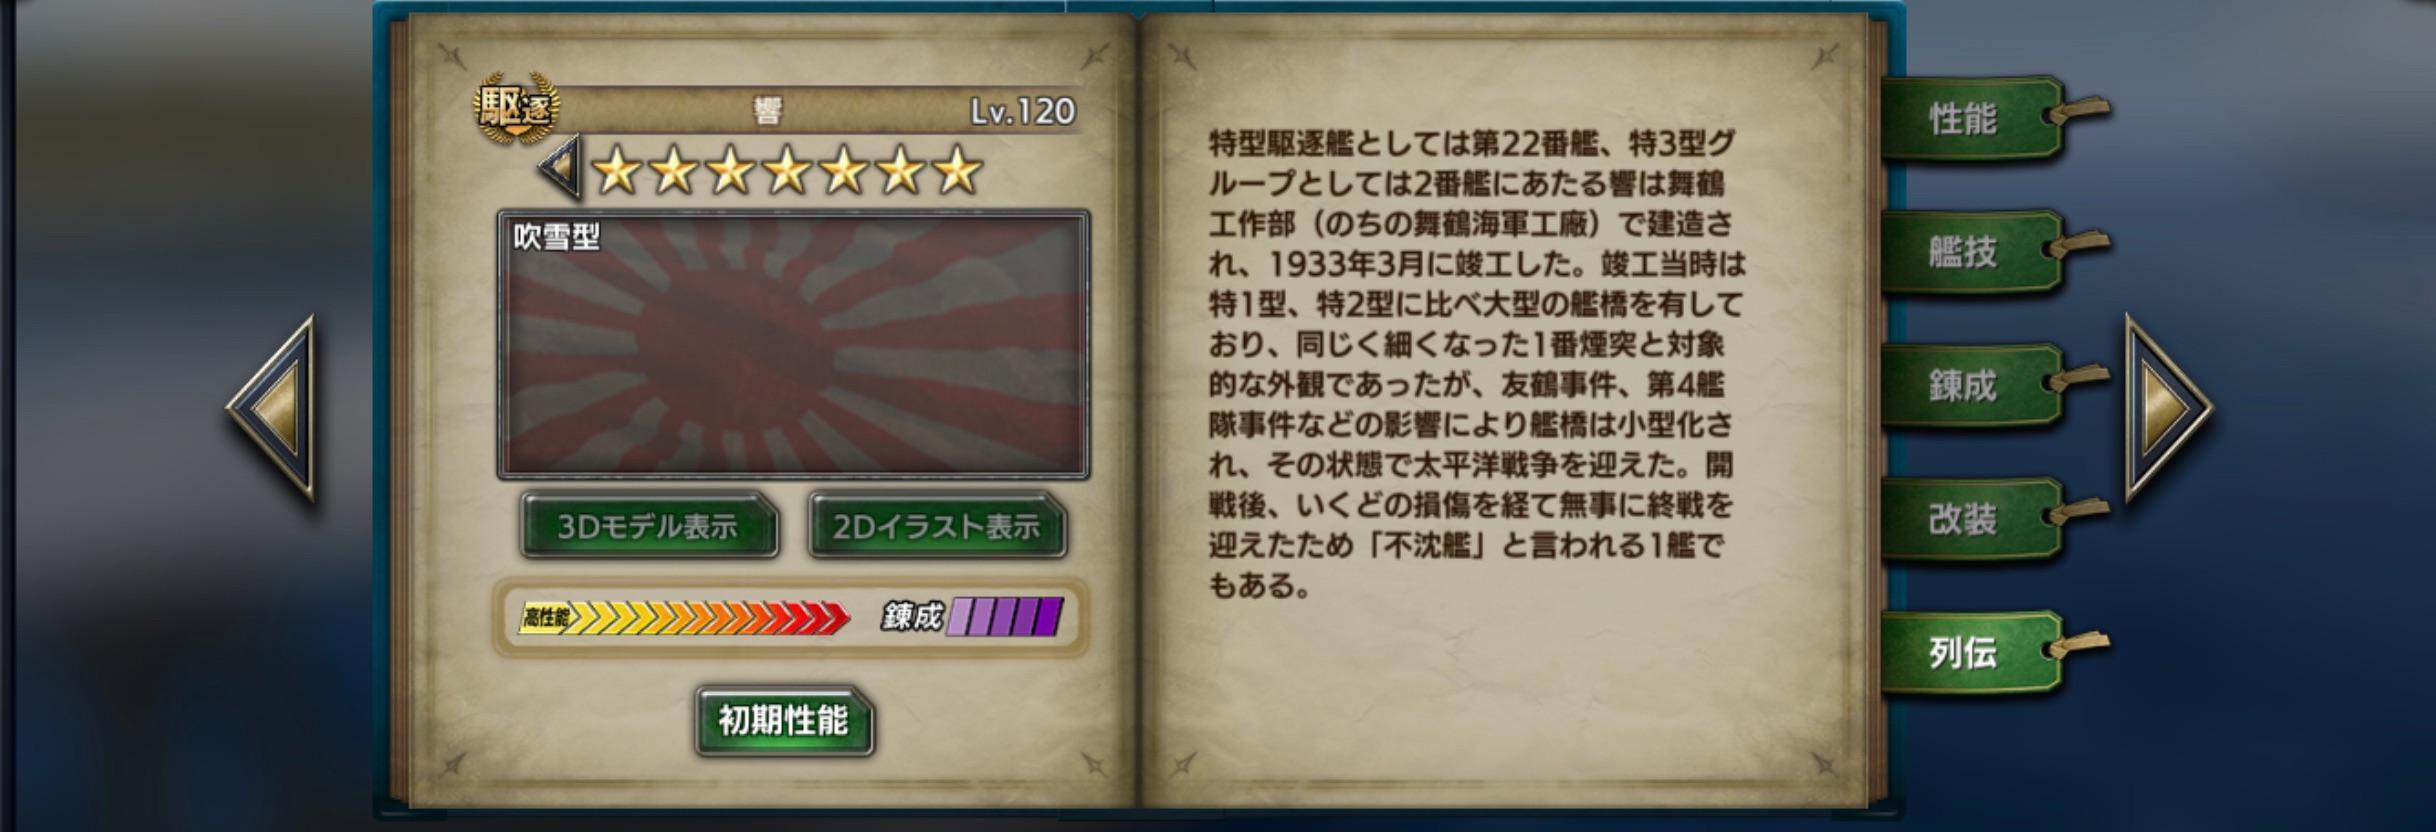 Hibiki-history